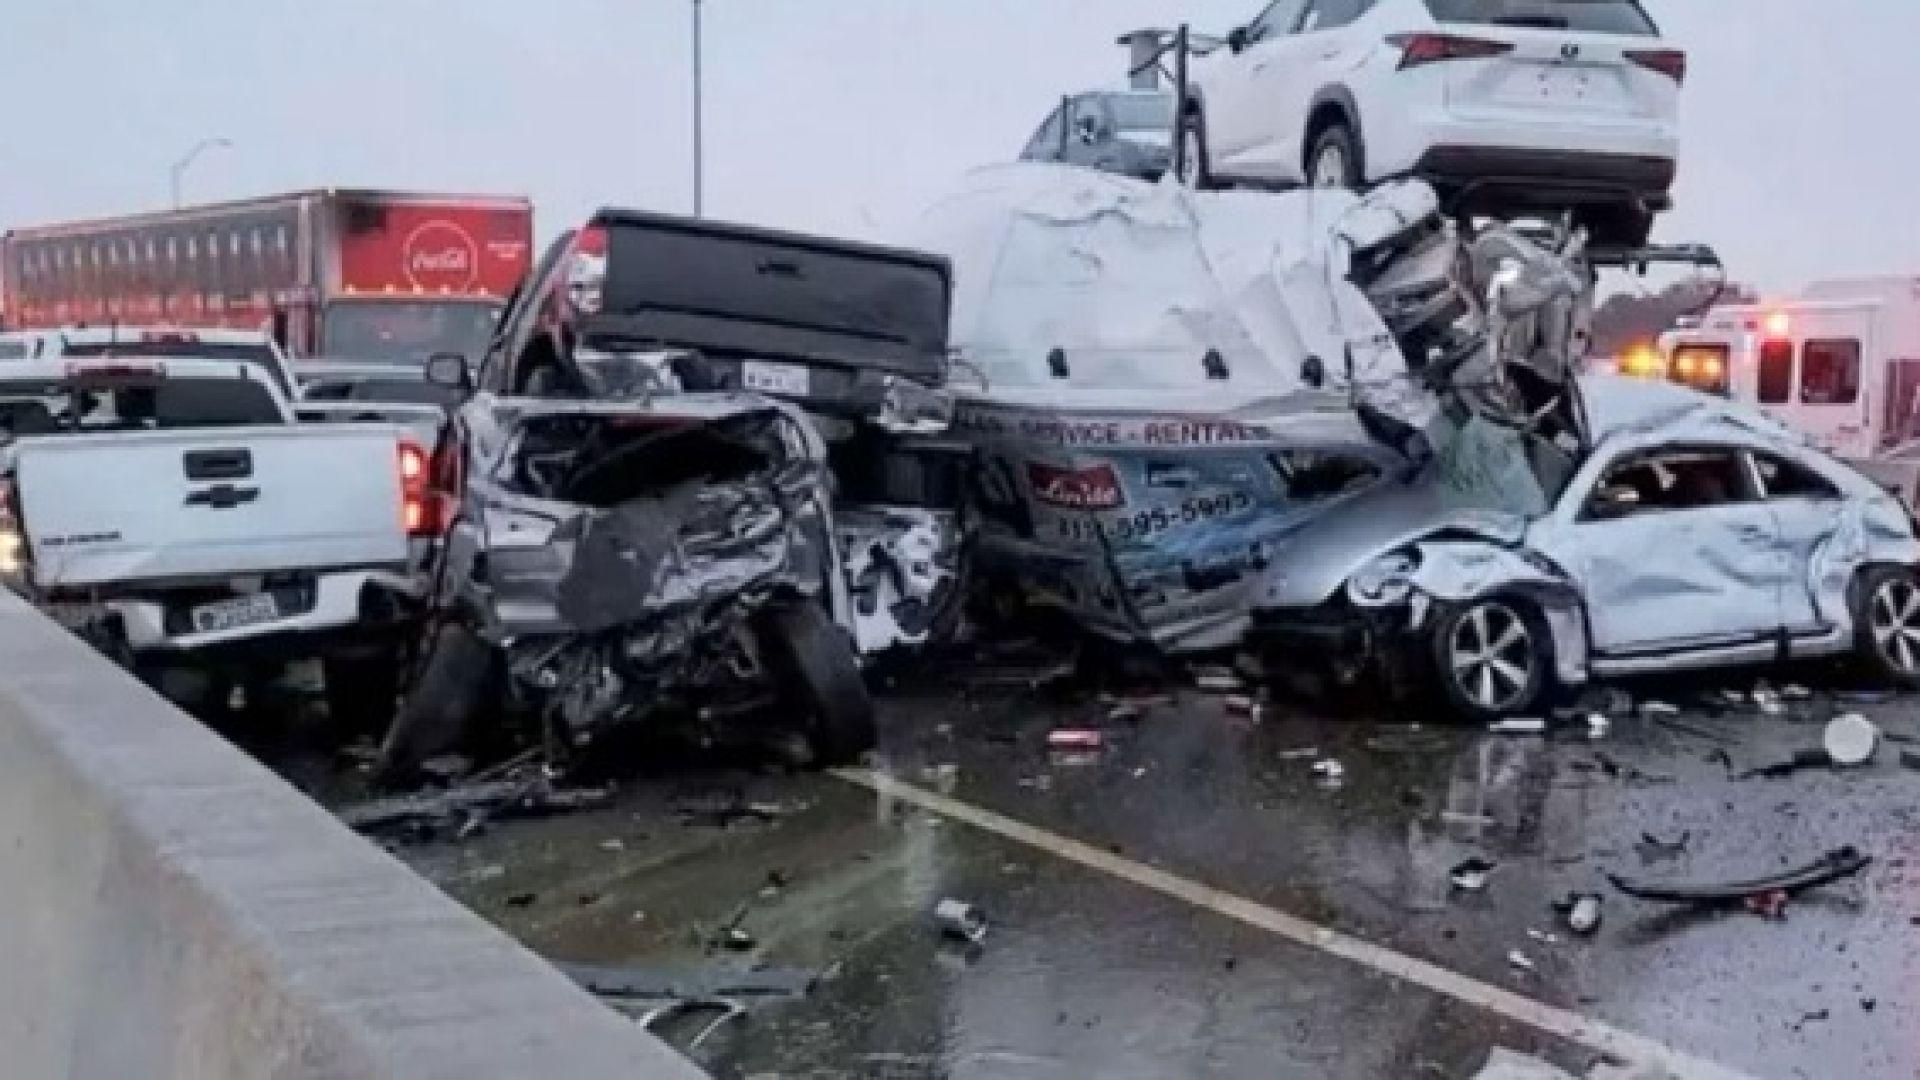 9 деца загинаха при верижна катастрофа от 15 автомобила заради тропическа буря в Алабама (видео)